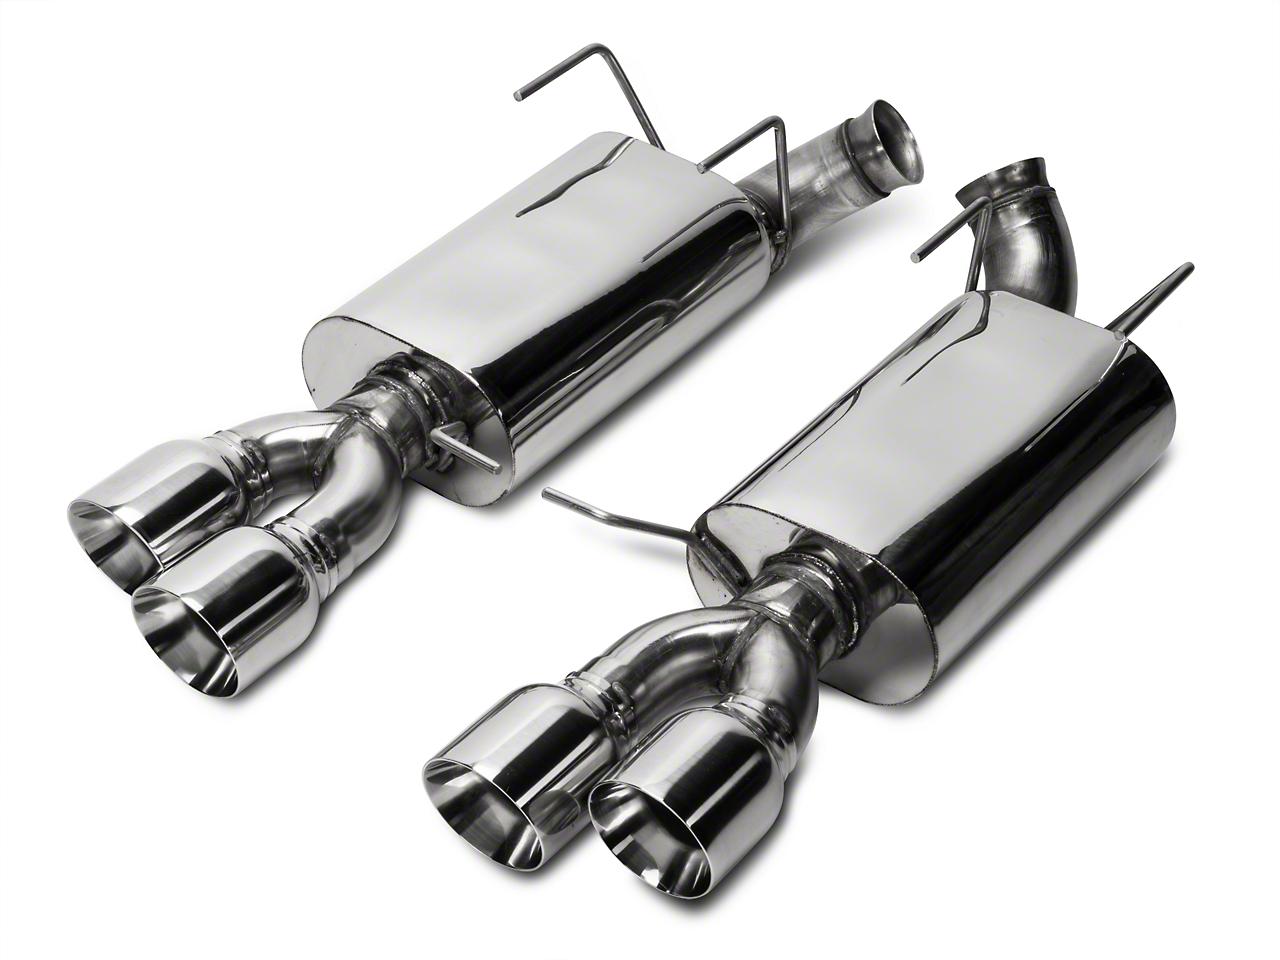 Kooks Performance Axle-Back Exhaust w/ Quad Tips (13-14 GT500)